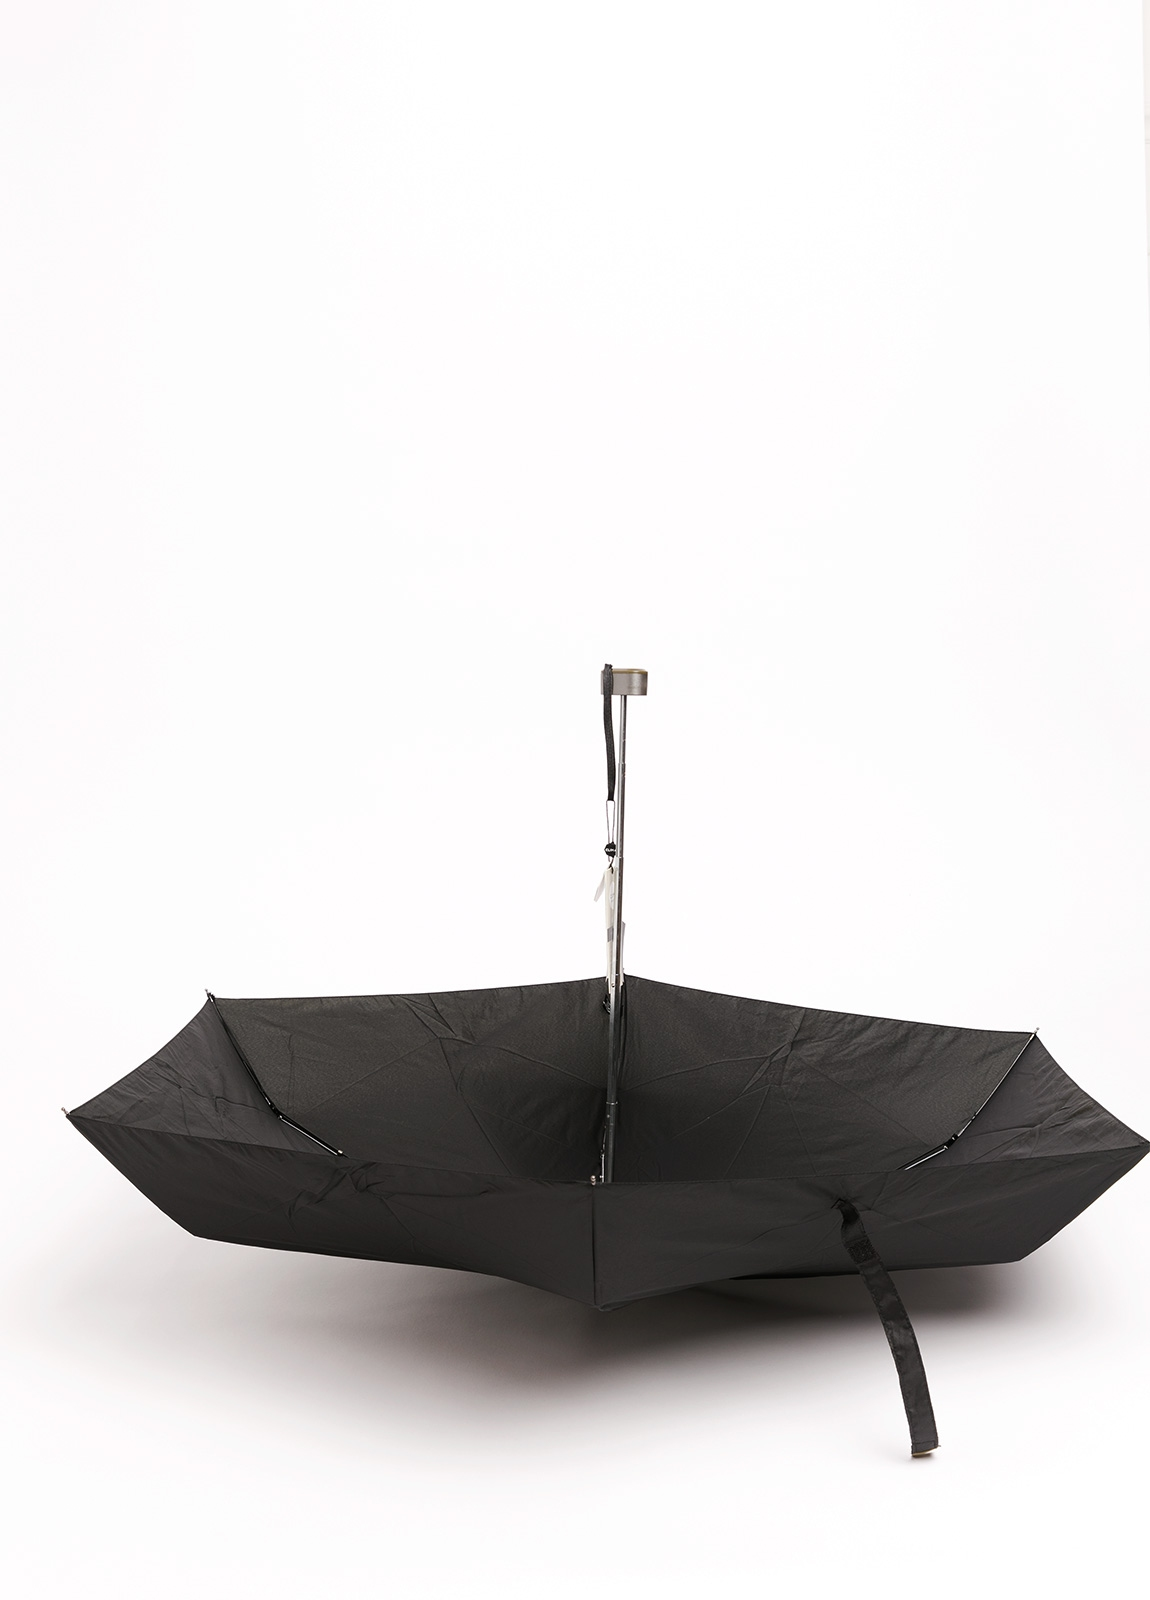 Paraguas FUREST COLECCIÓN ultra compacto negro. - Ítem1